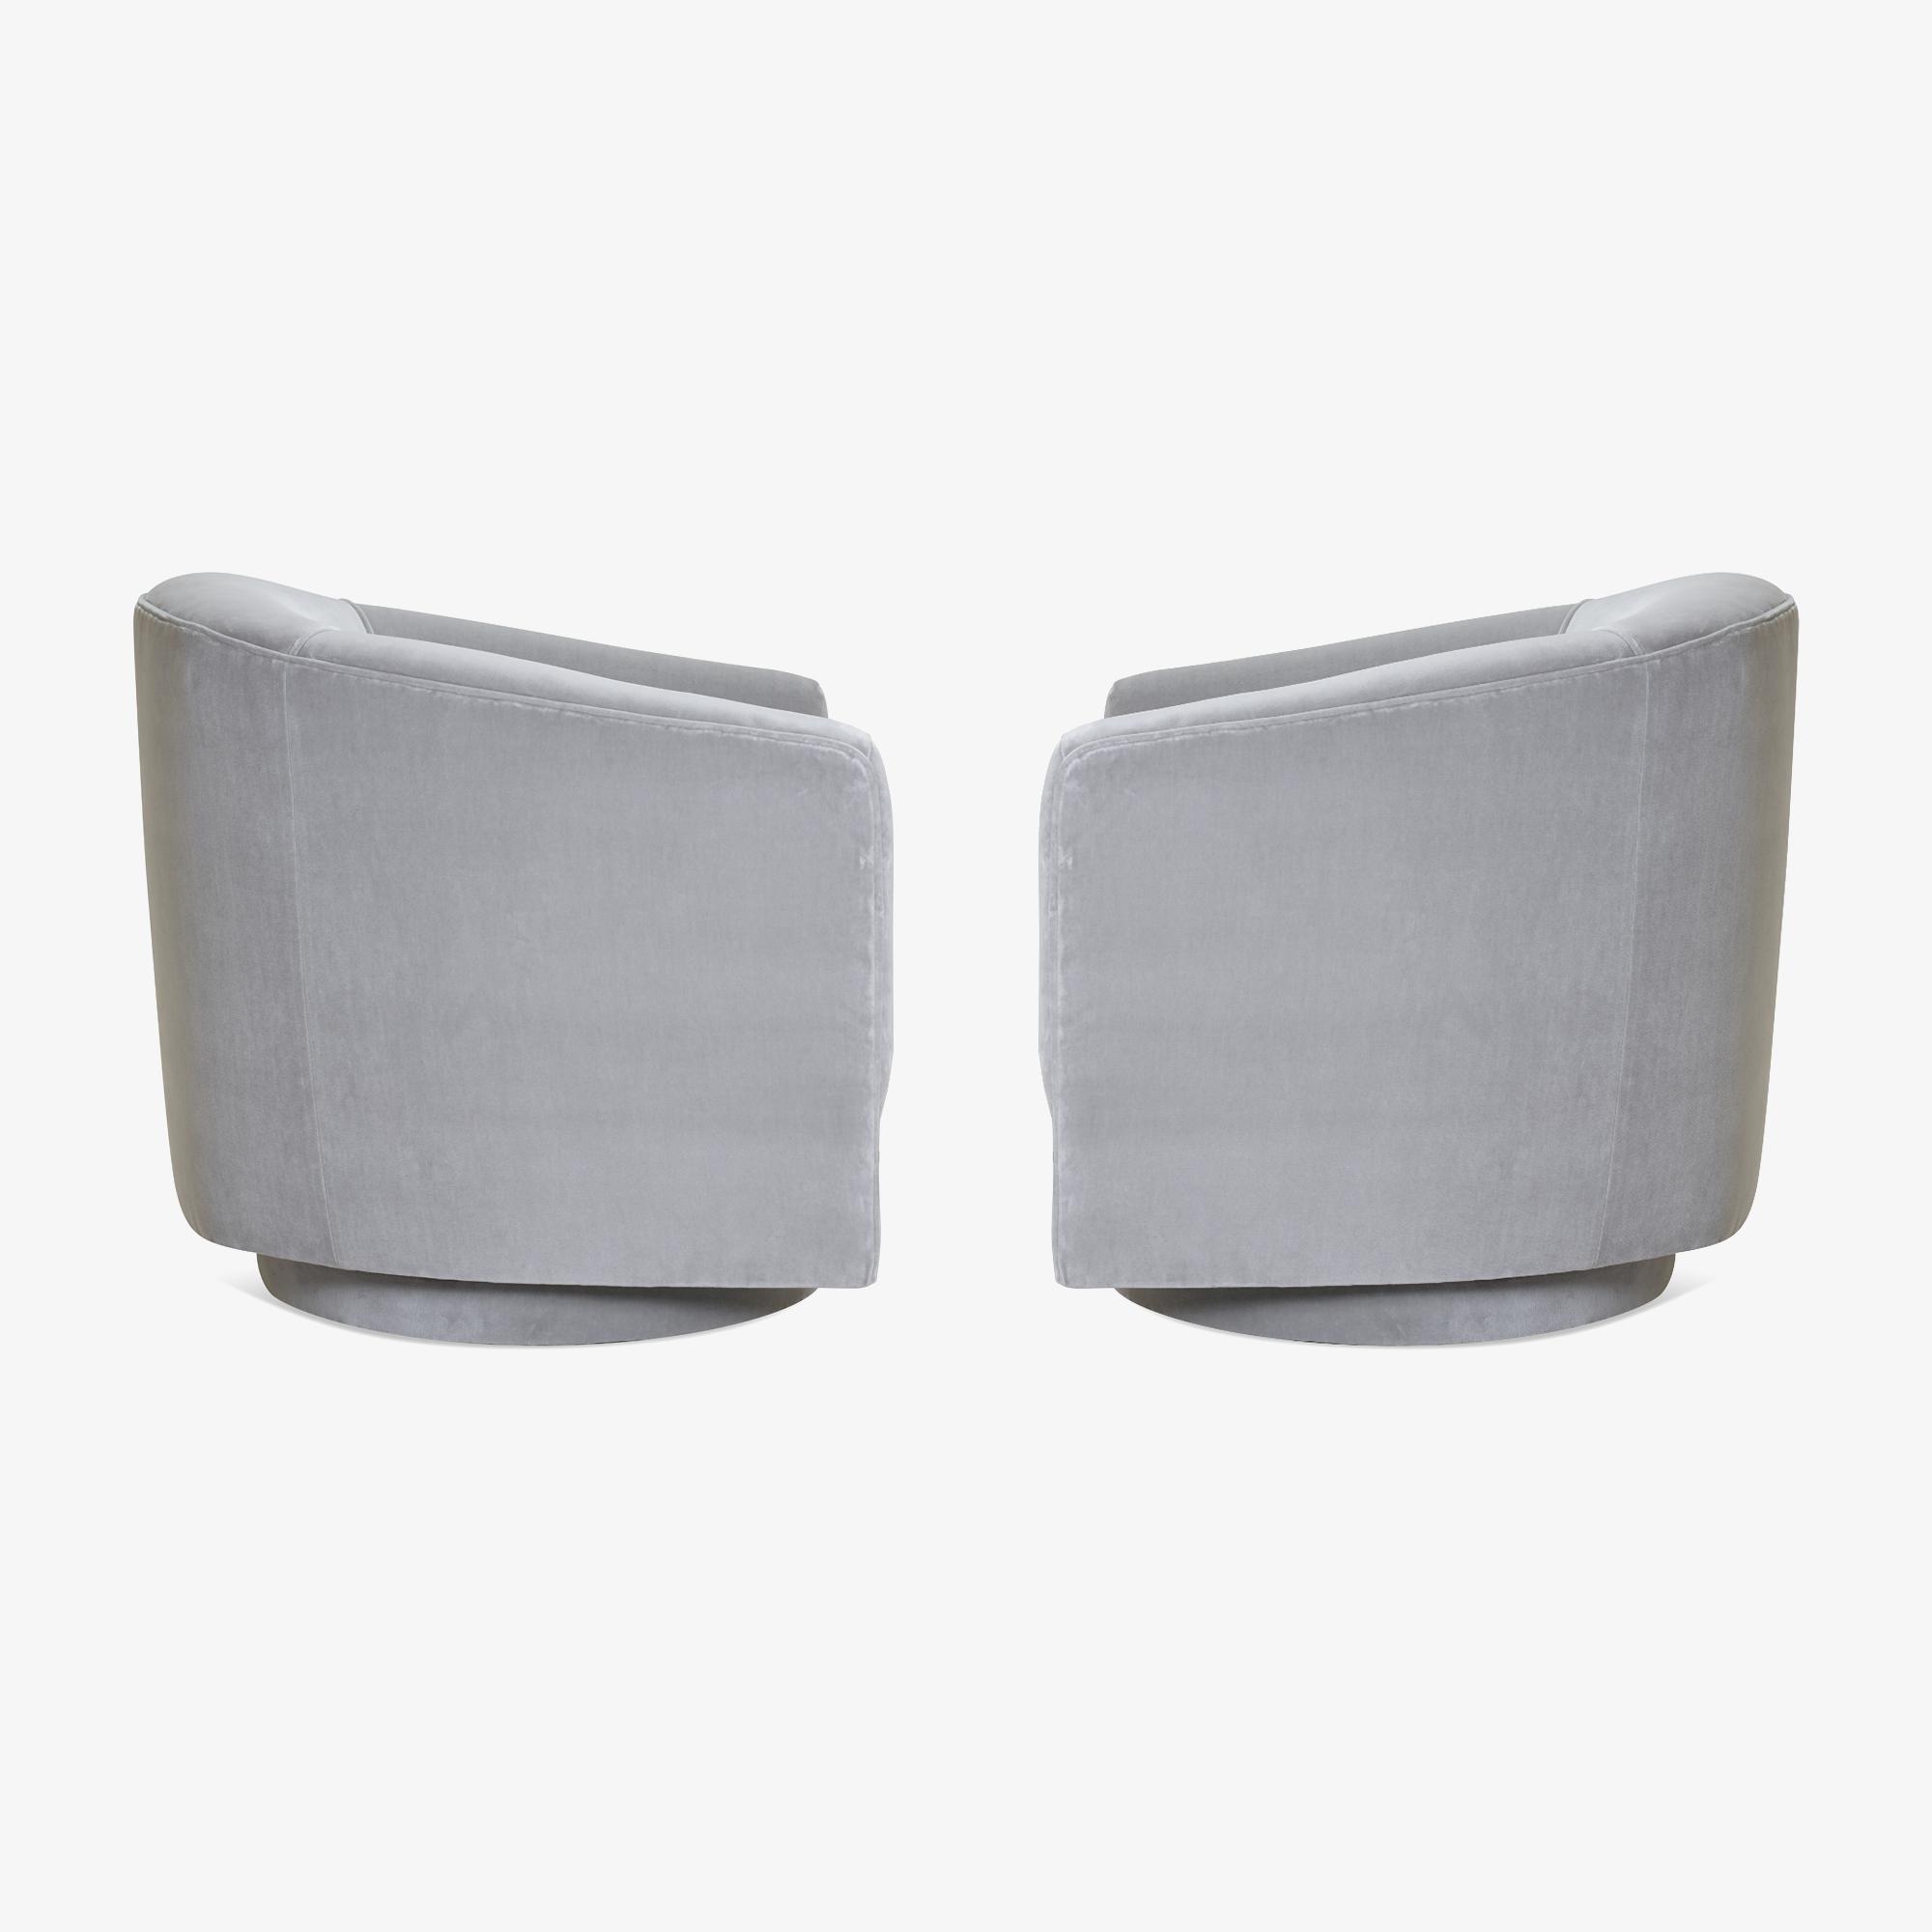 Swivel Tub Chairs in Dove Velvet, Pair3.png